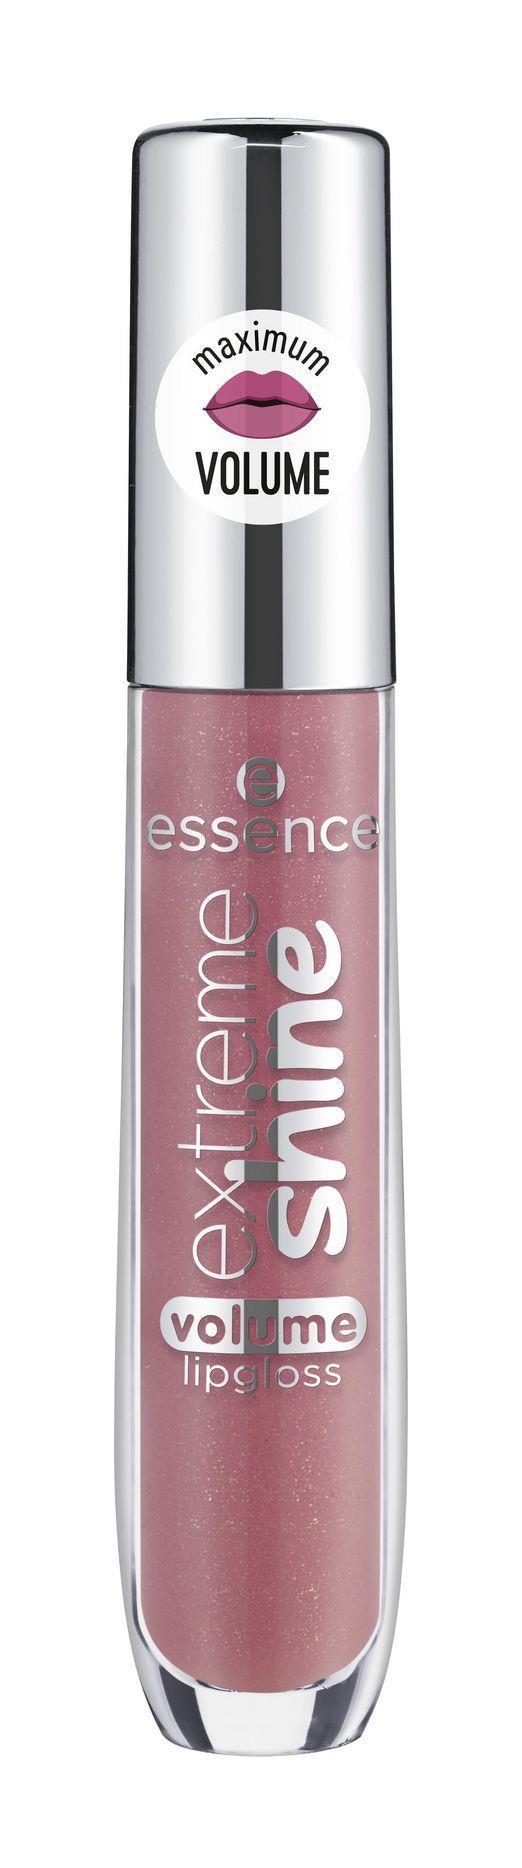 Купить Блеск для губ essence Extreme Shine Volume Lipgloss 09